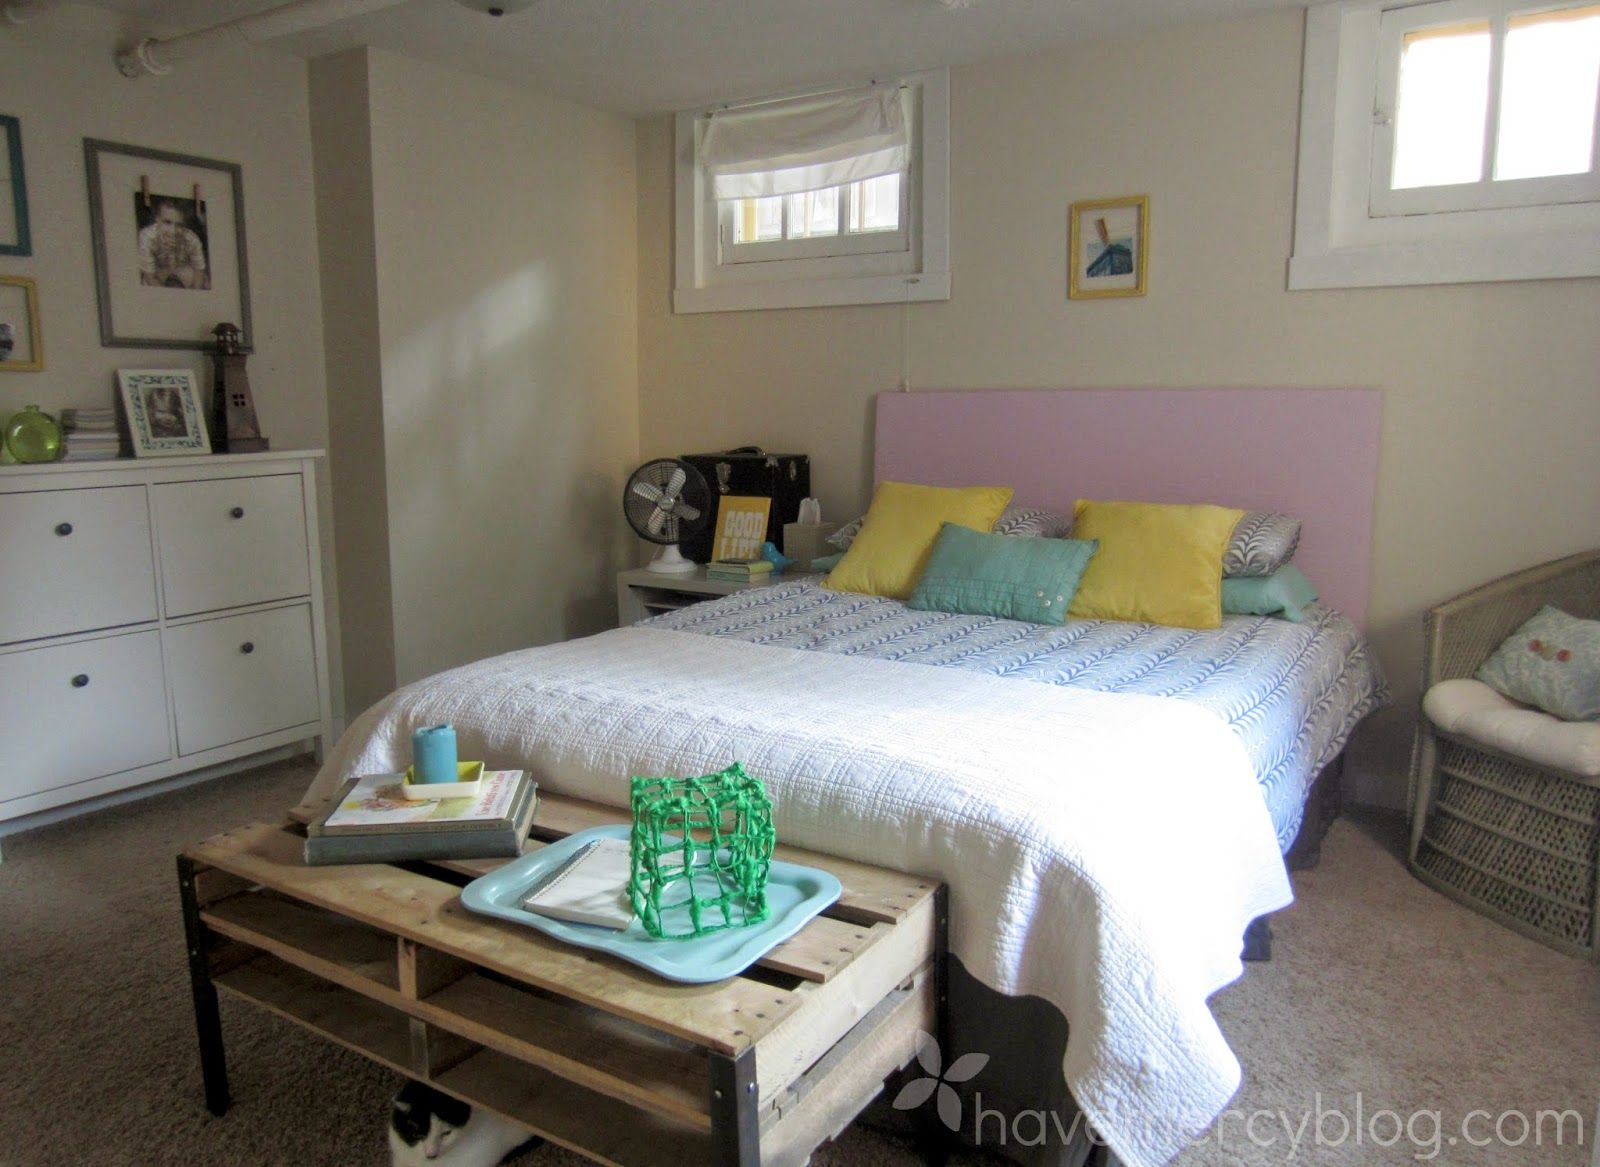 Guest room: pallet table, Ikea bedding, painted wicker chair, Ikea shoe shelf - HaveMercy